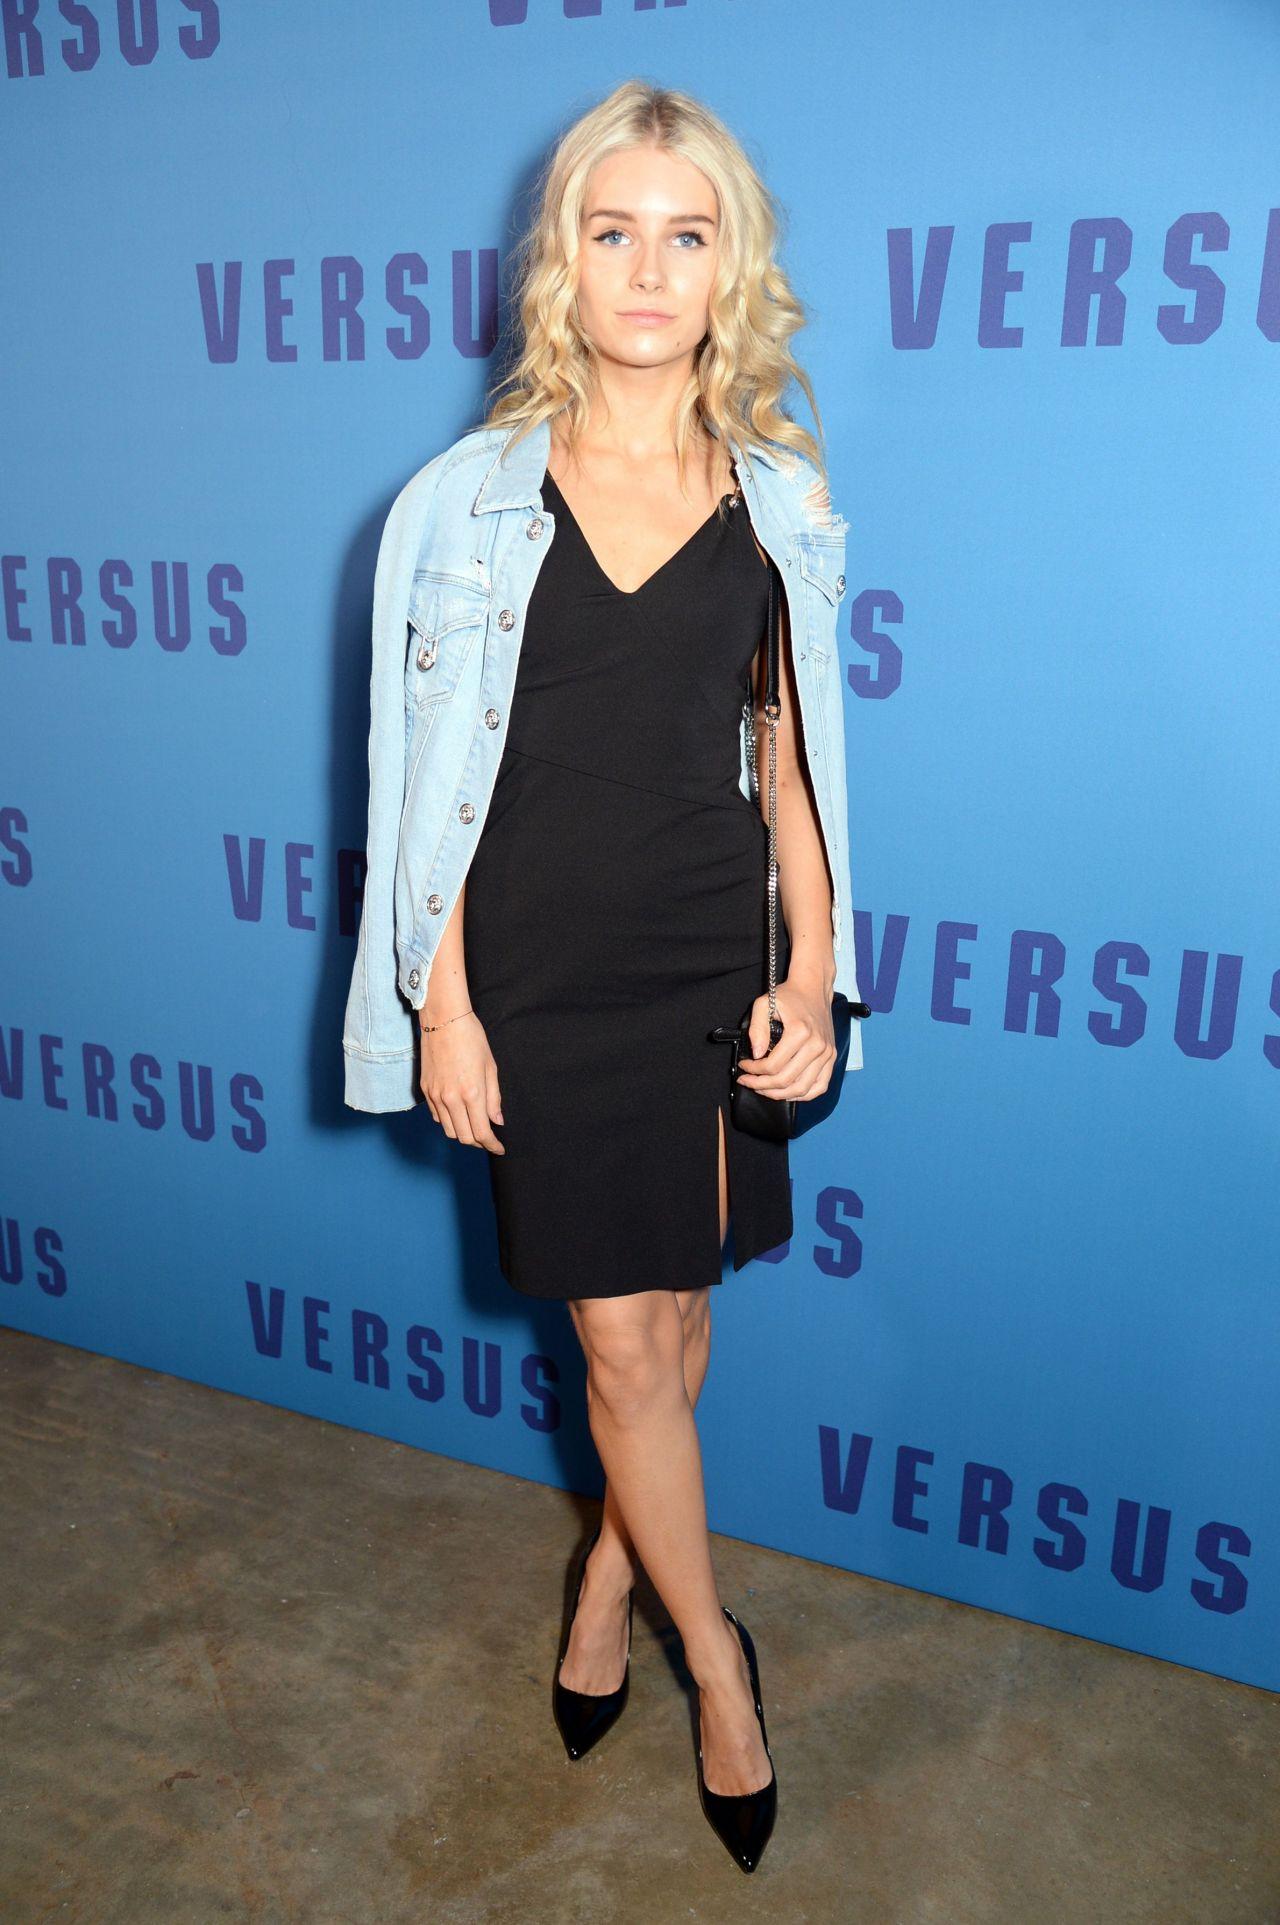 Lottie Moss - Versace VERSUS Fashion Show in London 2/18/ 2017